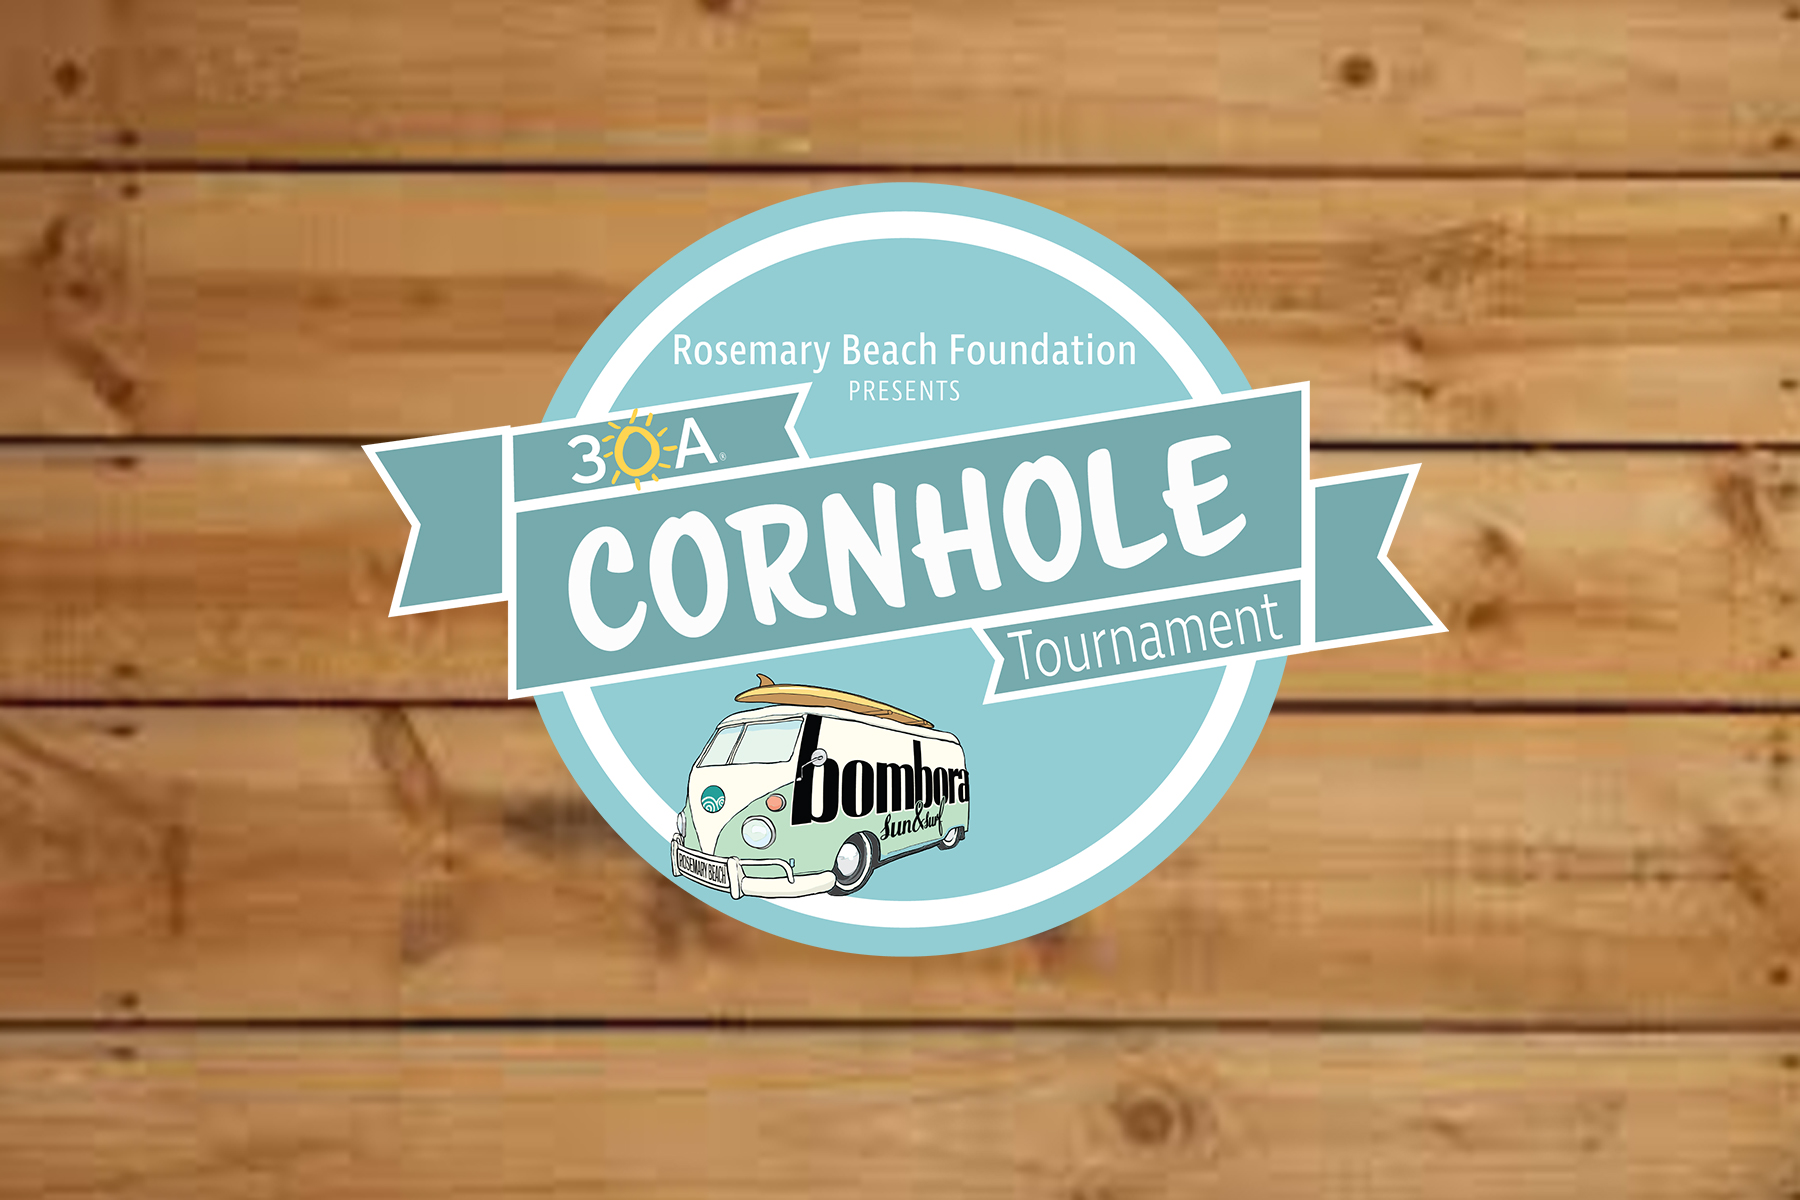 3rd ANNUAL 30A CORNHOLE TOURNAMENT